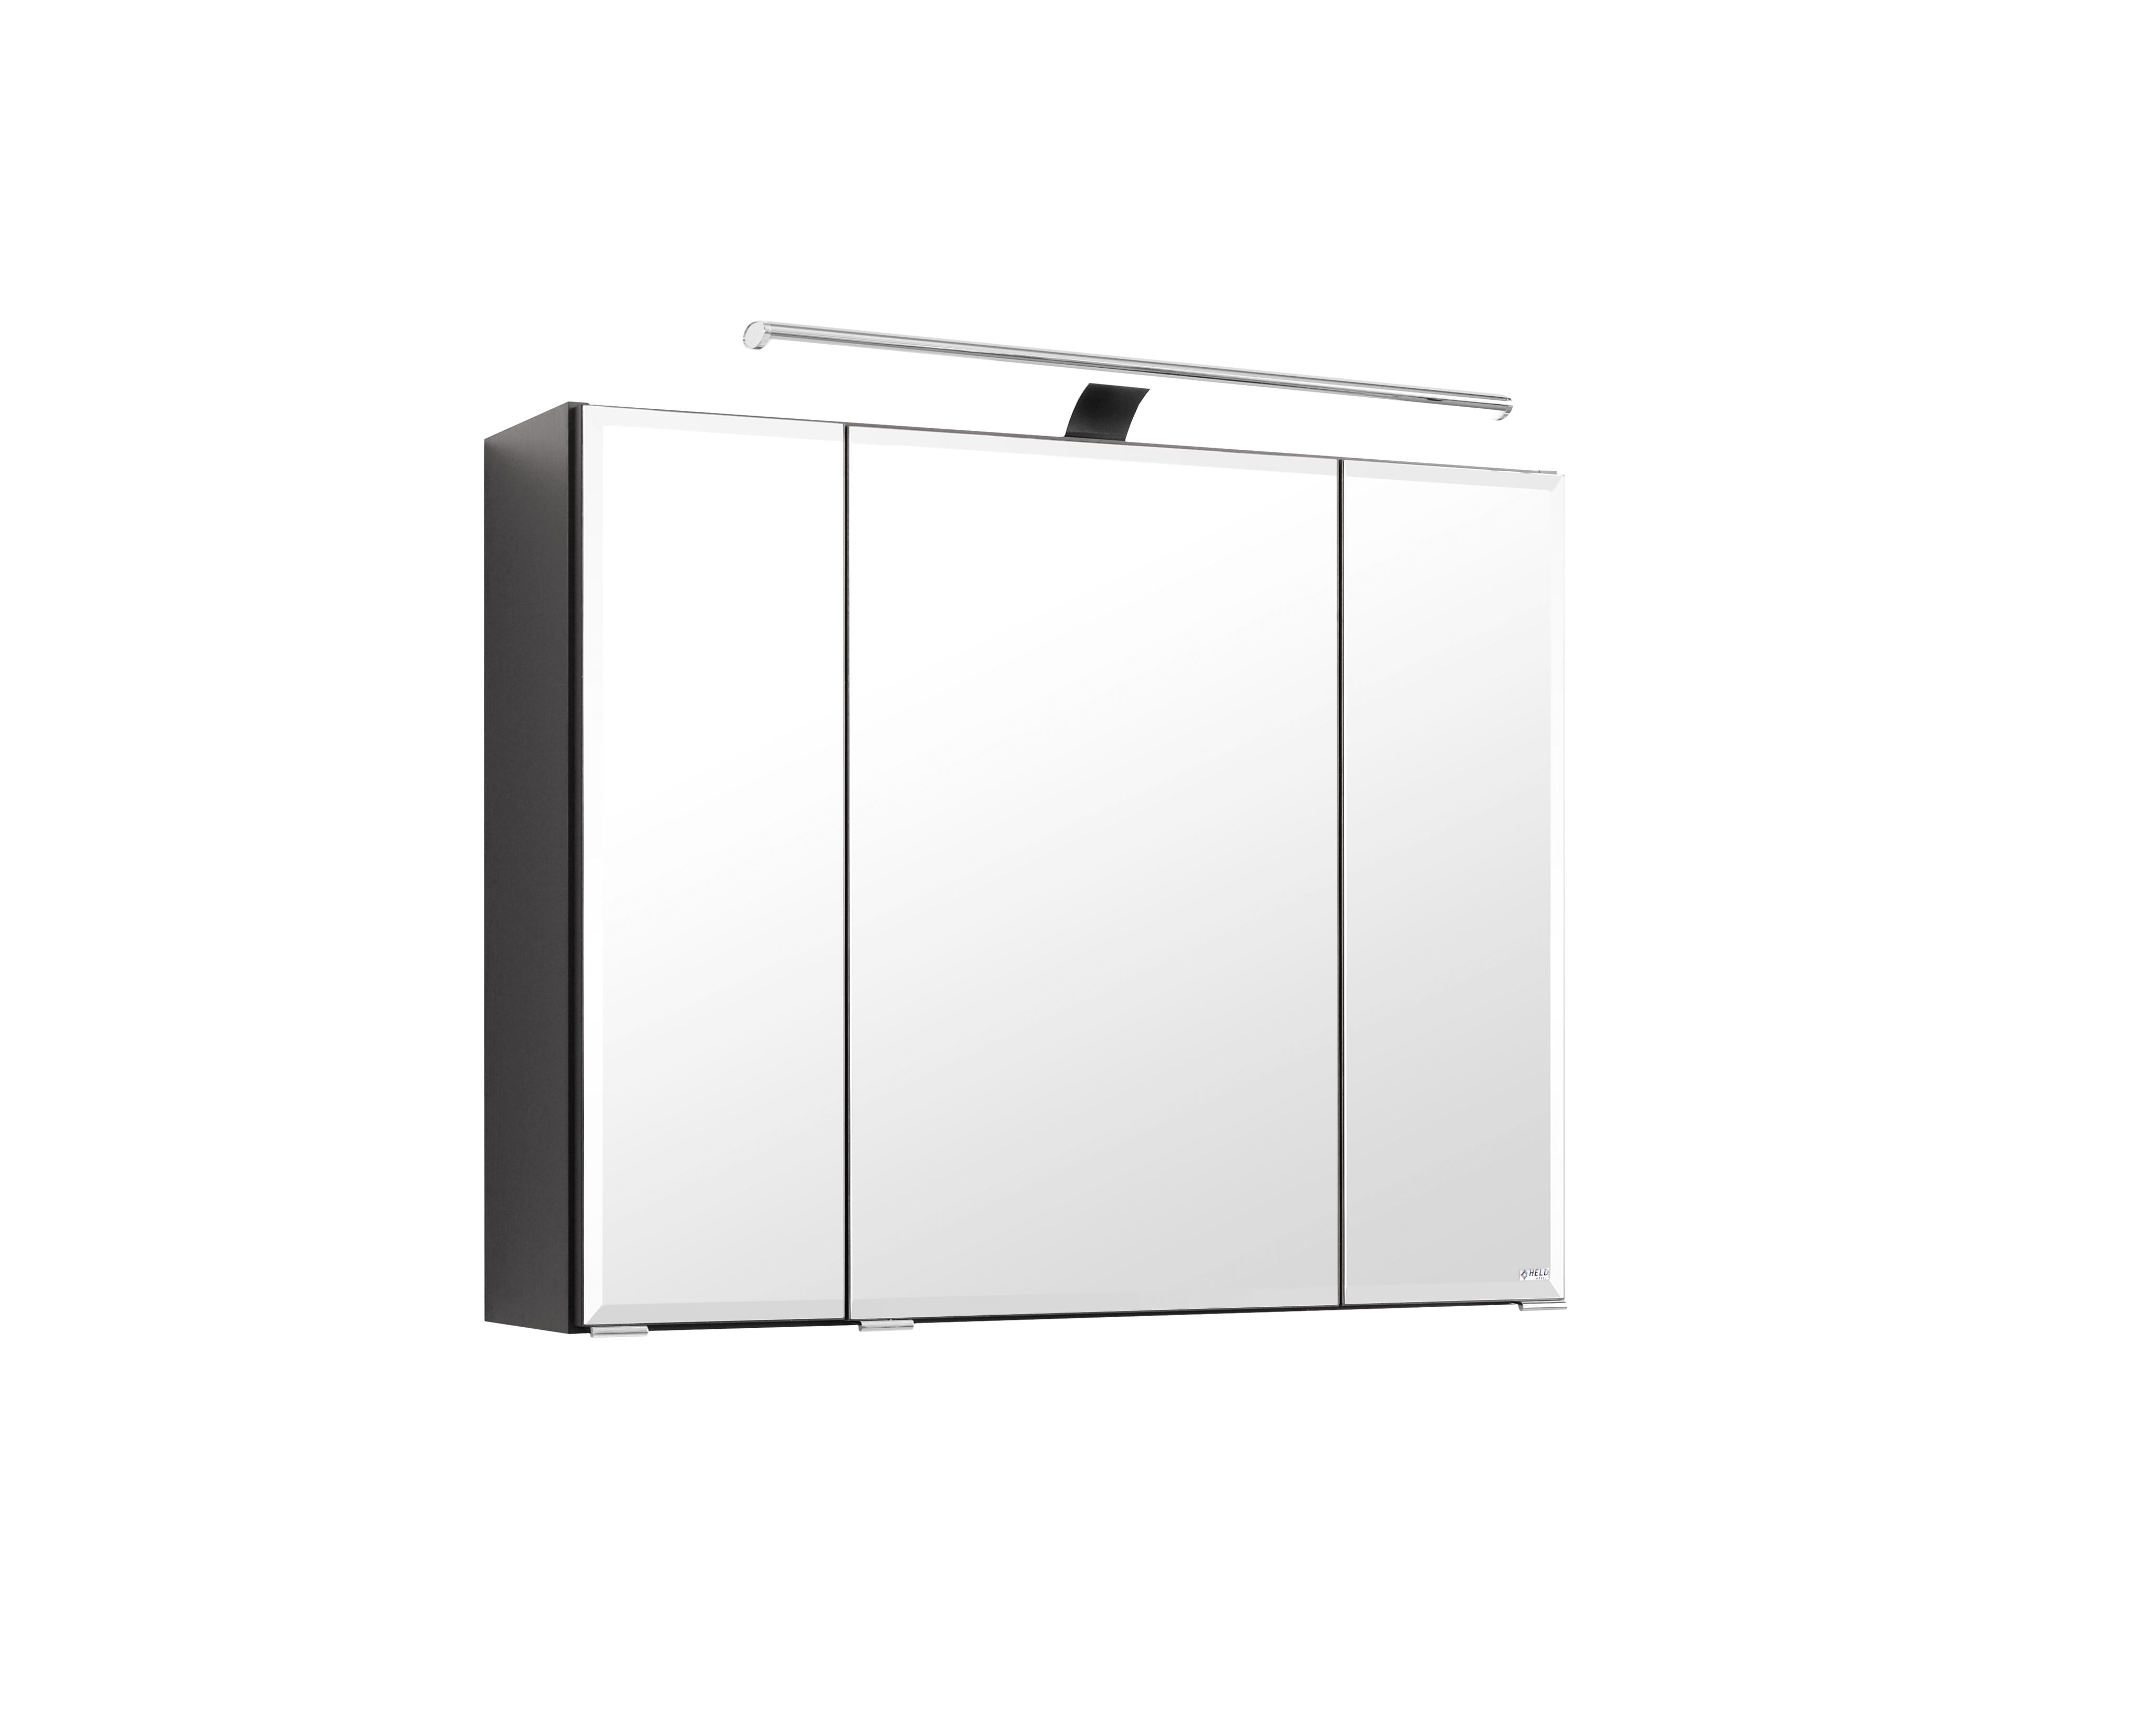 3d spiegelschrank 60 inkl halogen beleuchtung rimini von held m bel weiss by ebay. Black Bedroom Furniture Sets. Home Design Ideas